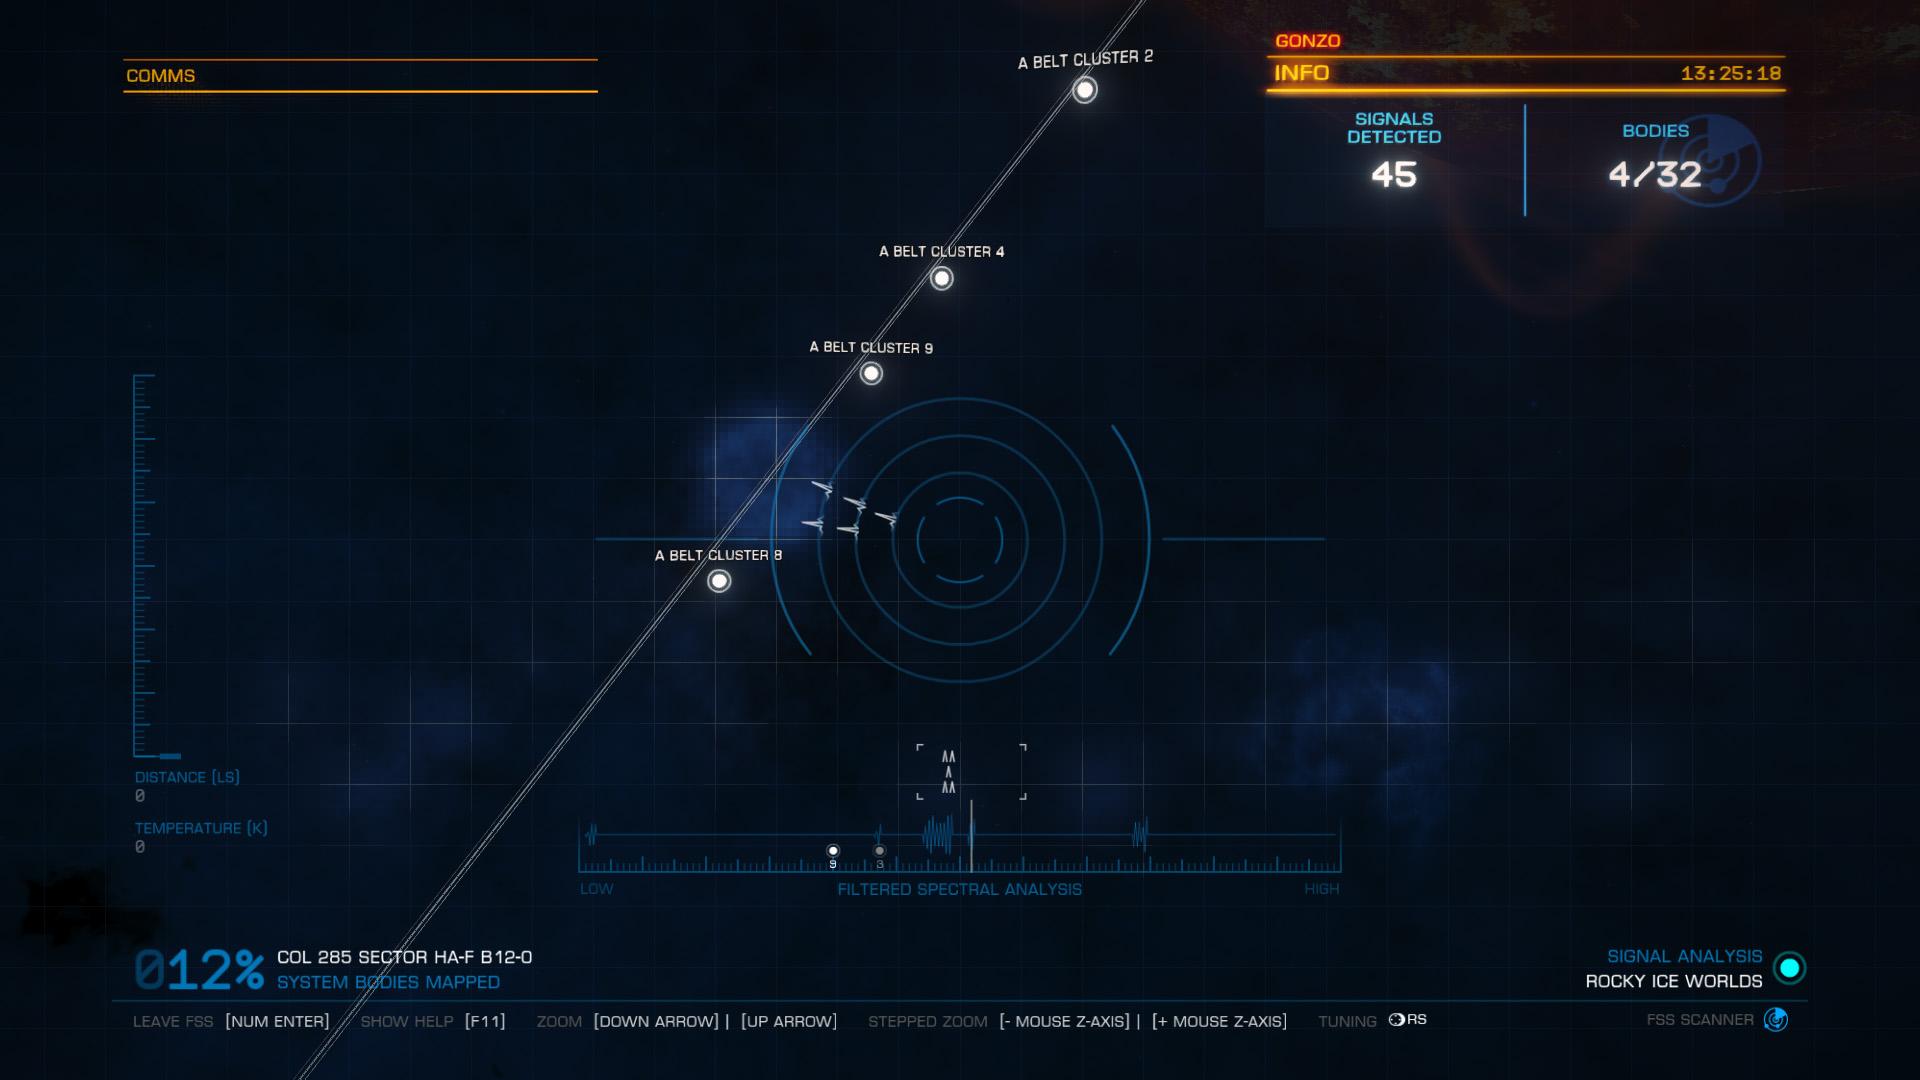 Elite: Dangerous beginner's guide: a screenshot showing how to align FSS patterns